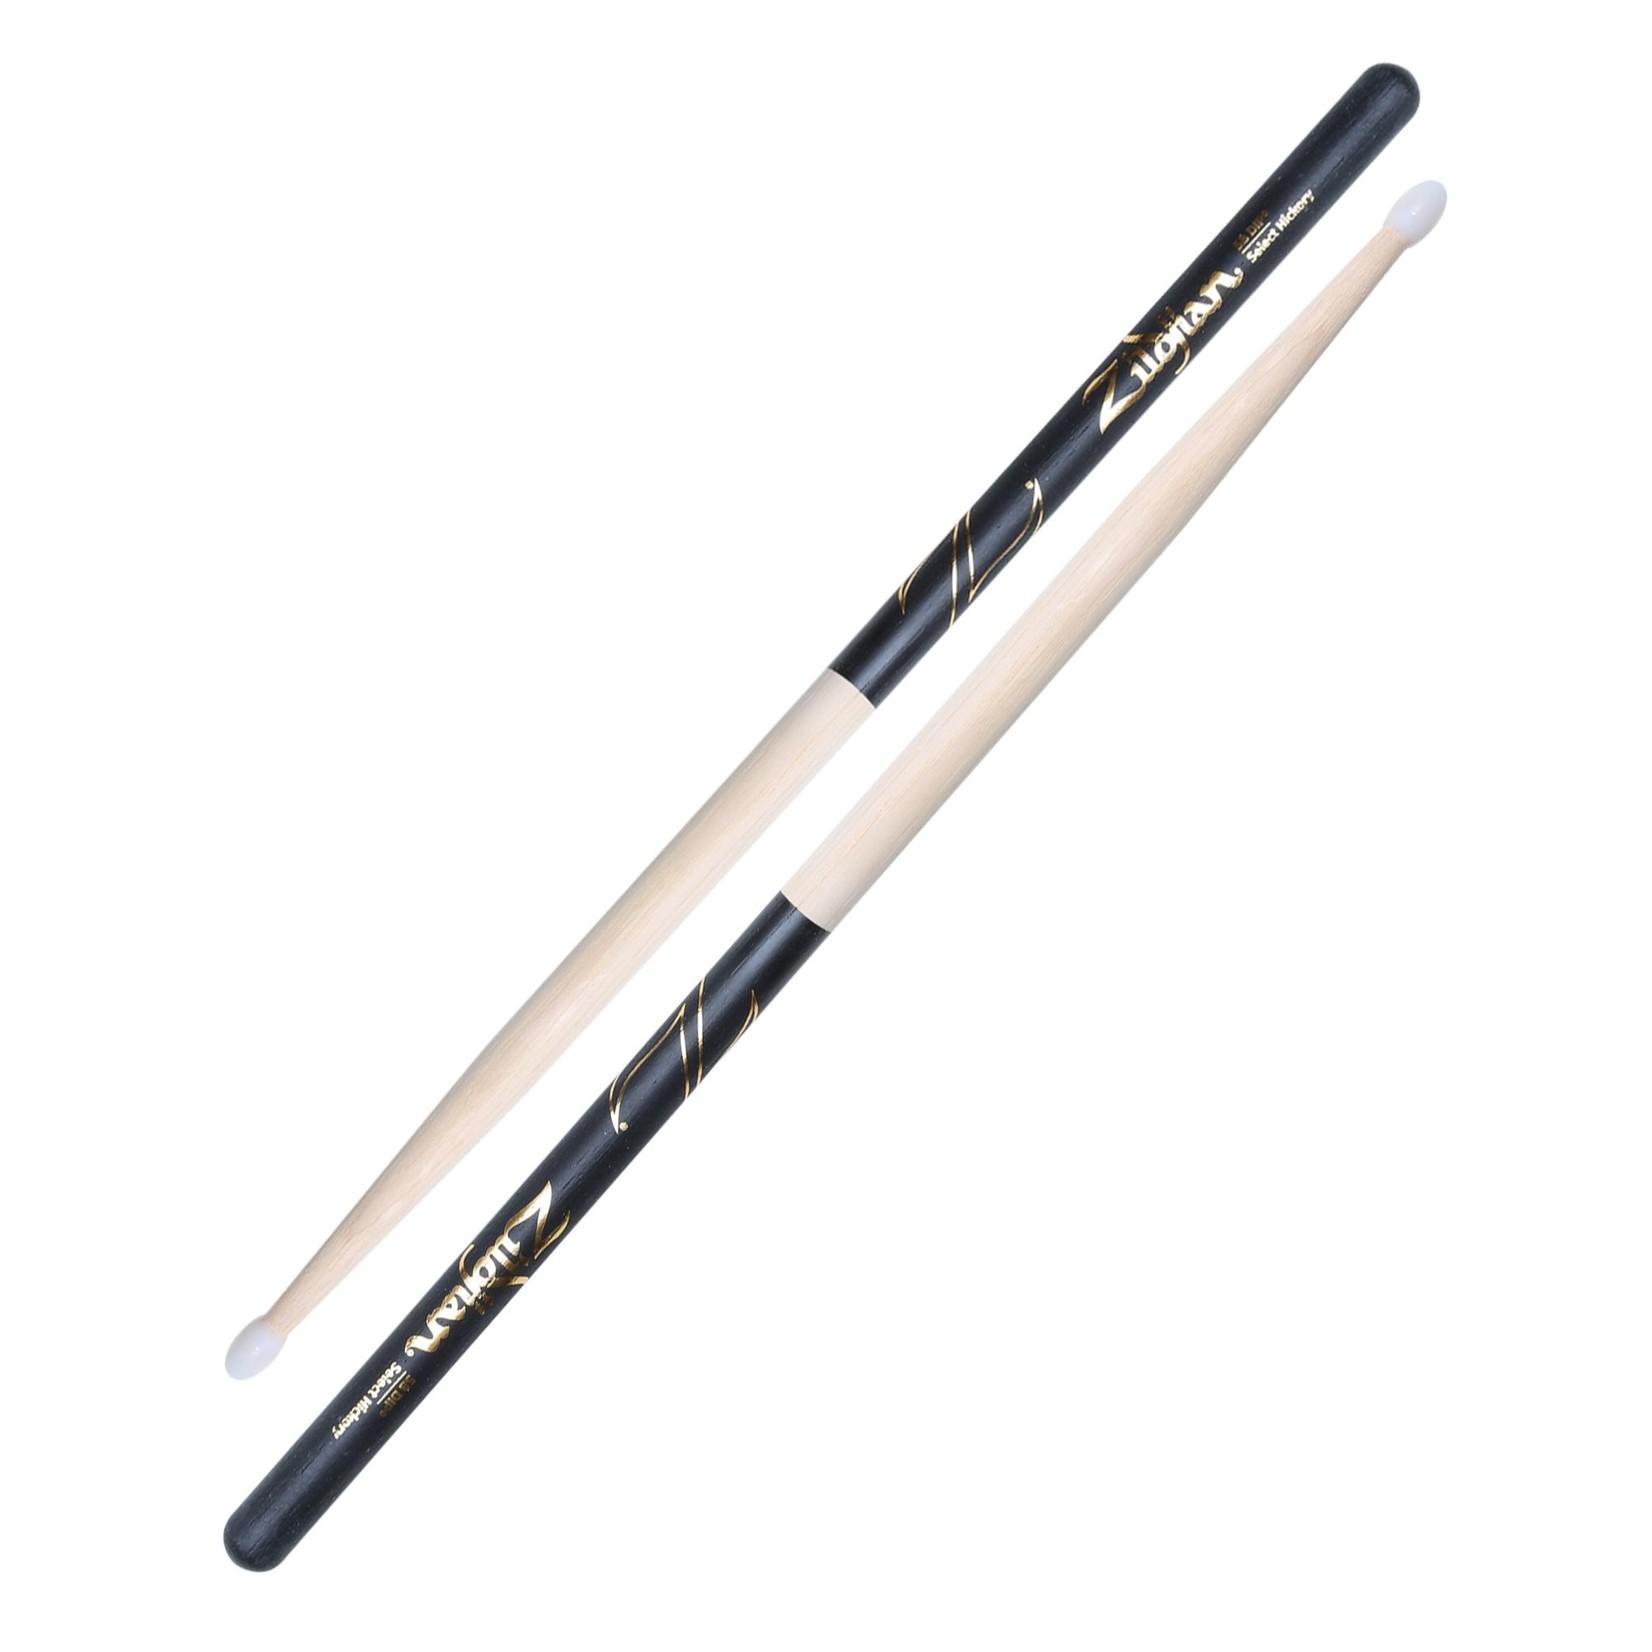 Zildjian Zildjian 5B Nylon DIP Drumsticks